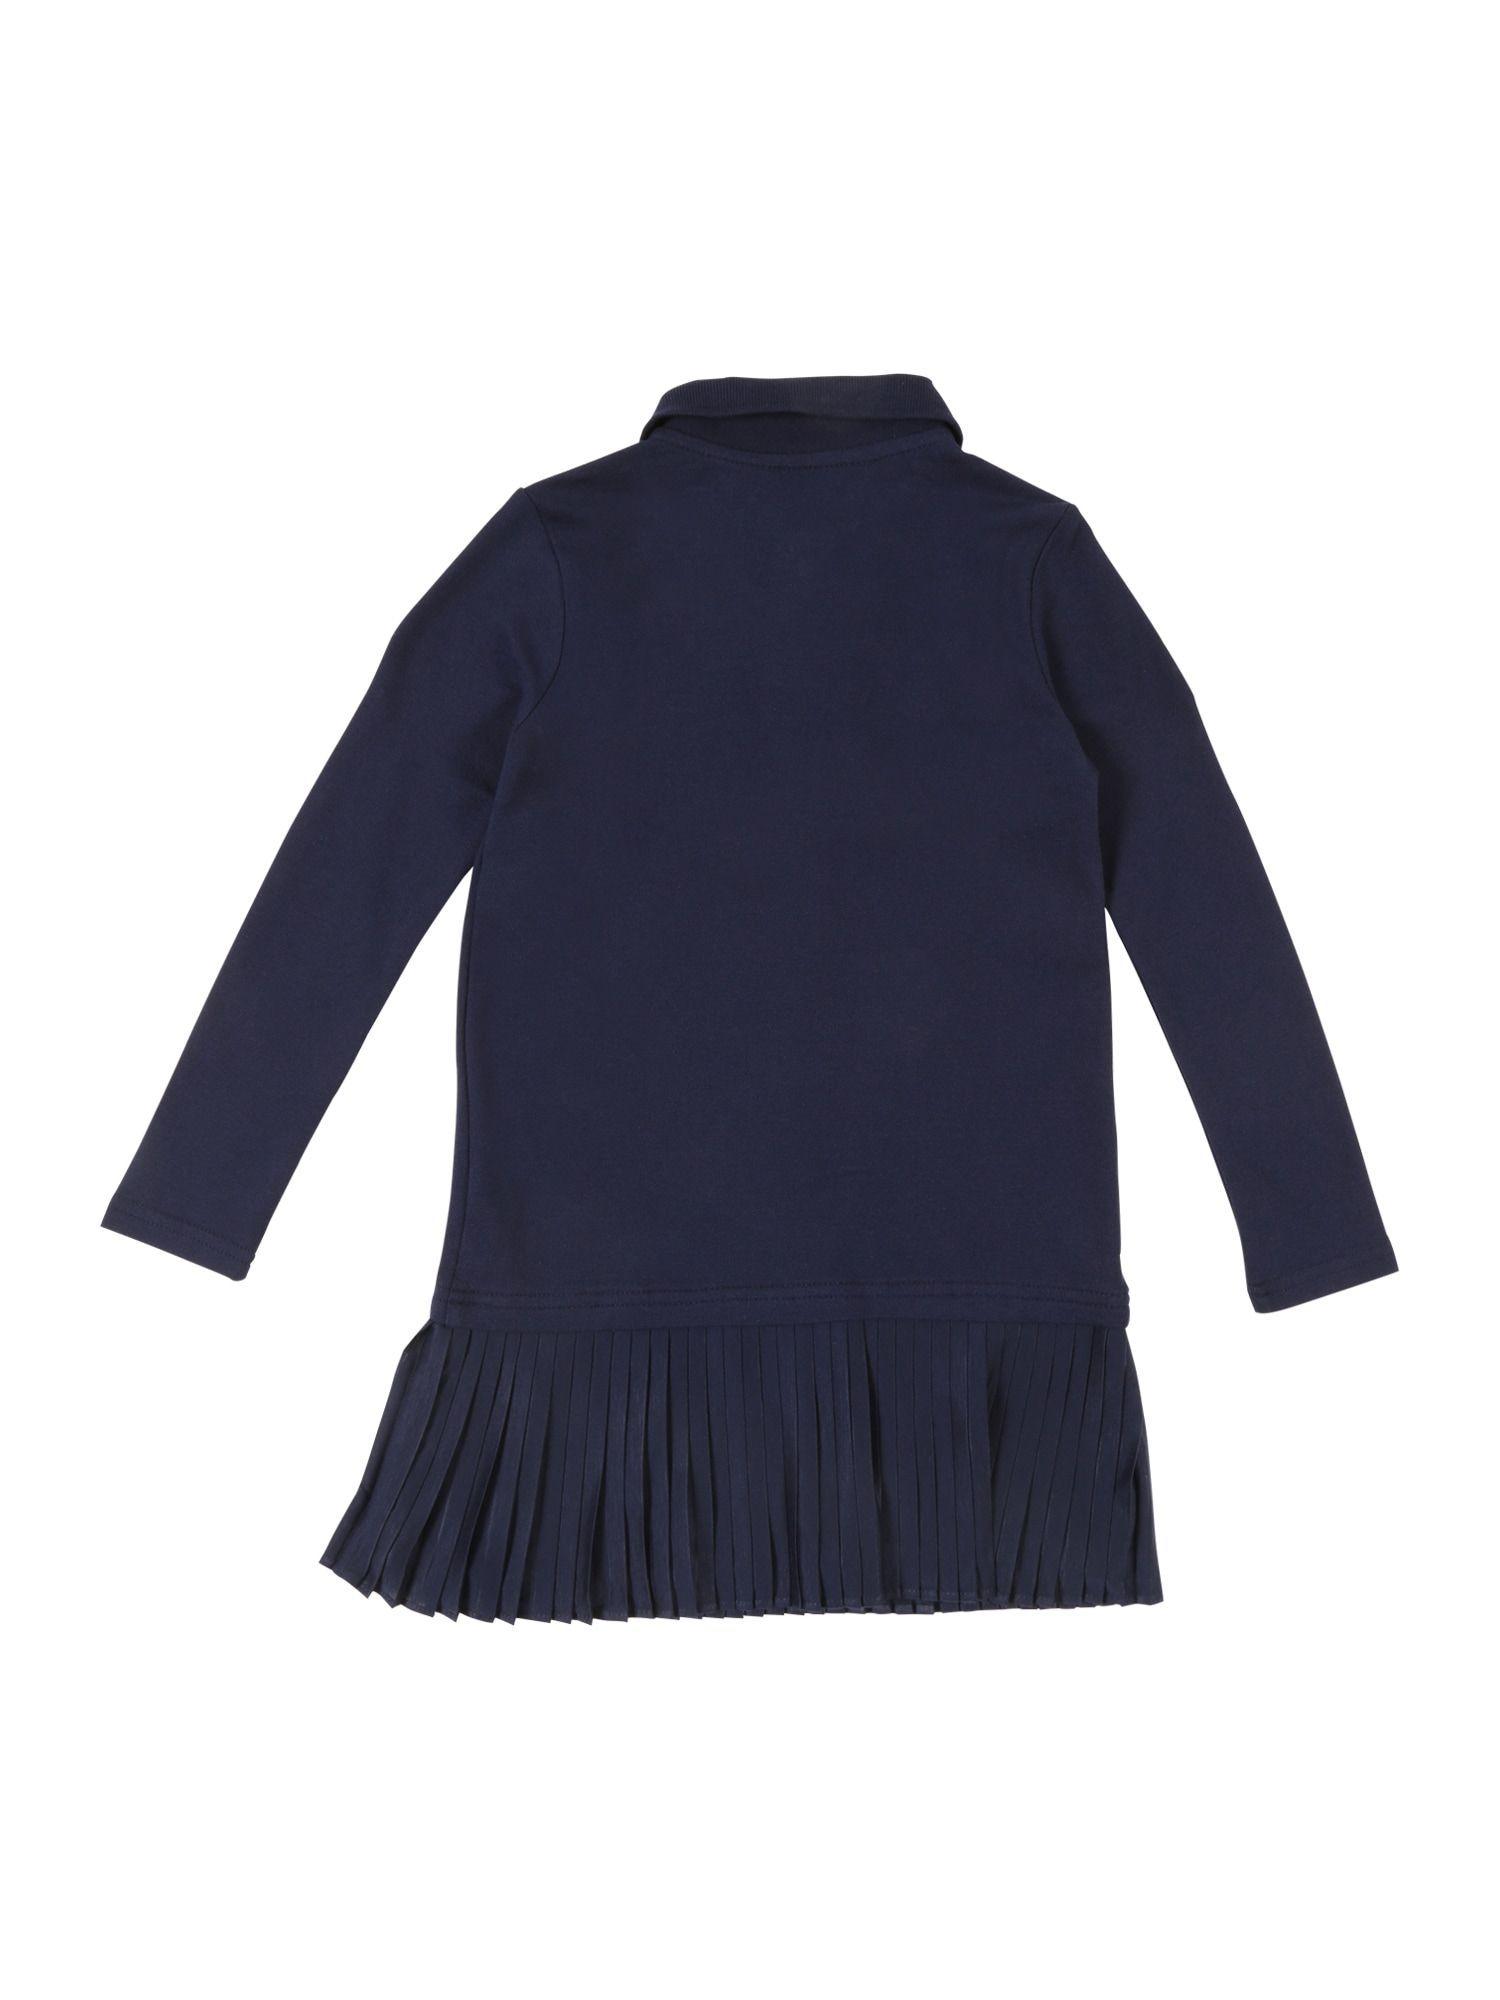 Pin On Herbst Mode Kleider